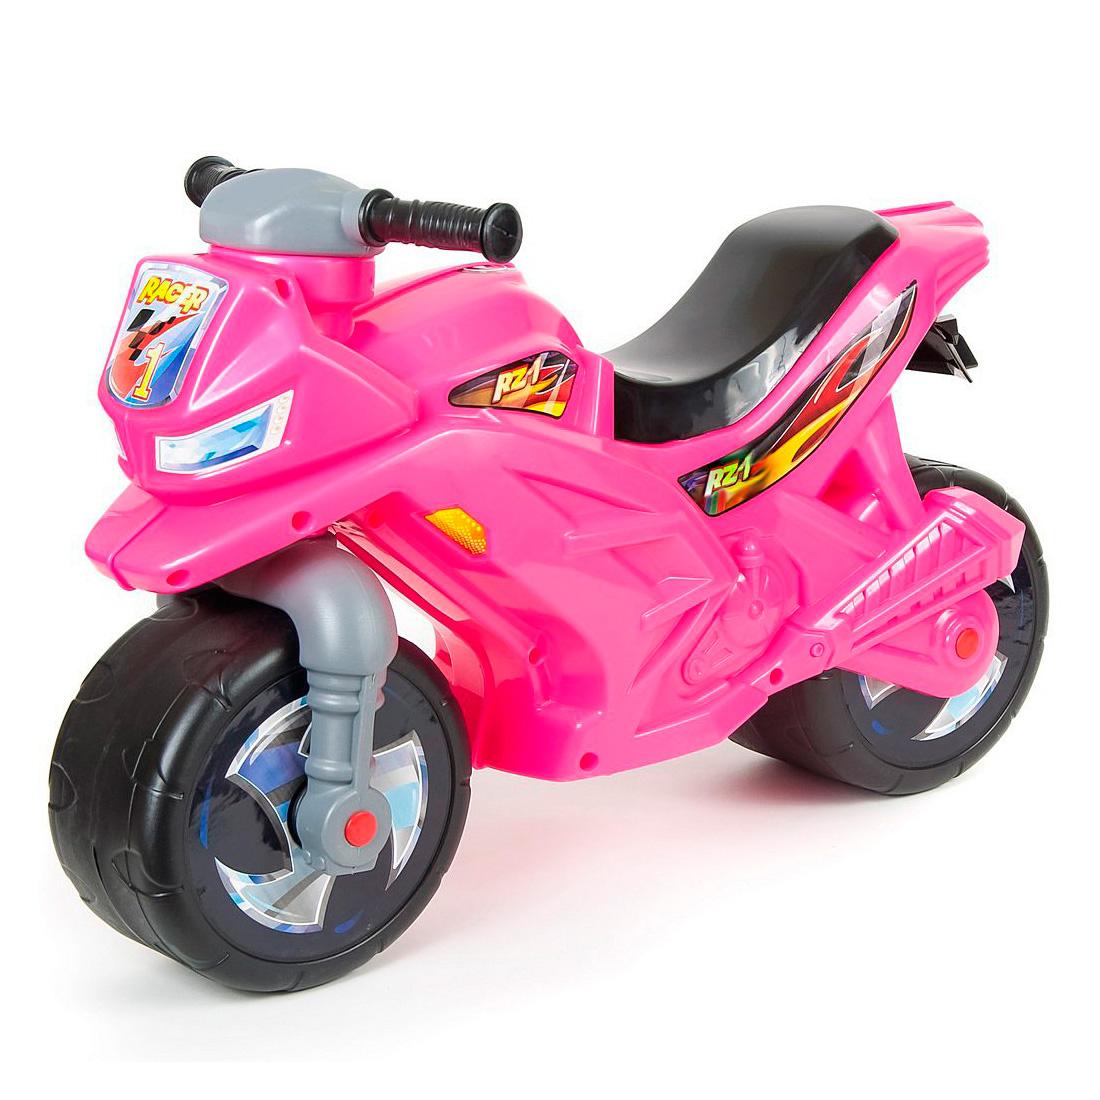 Каталка-беговел RT Racer RZ 1 ОР501 Розовый<br>